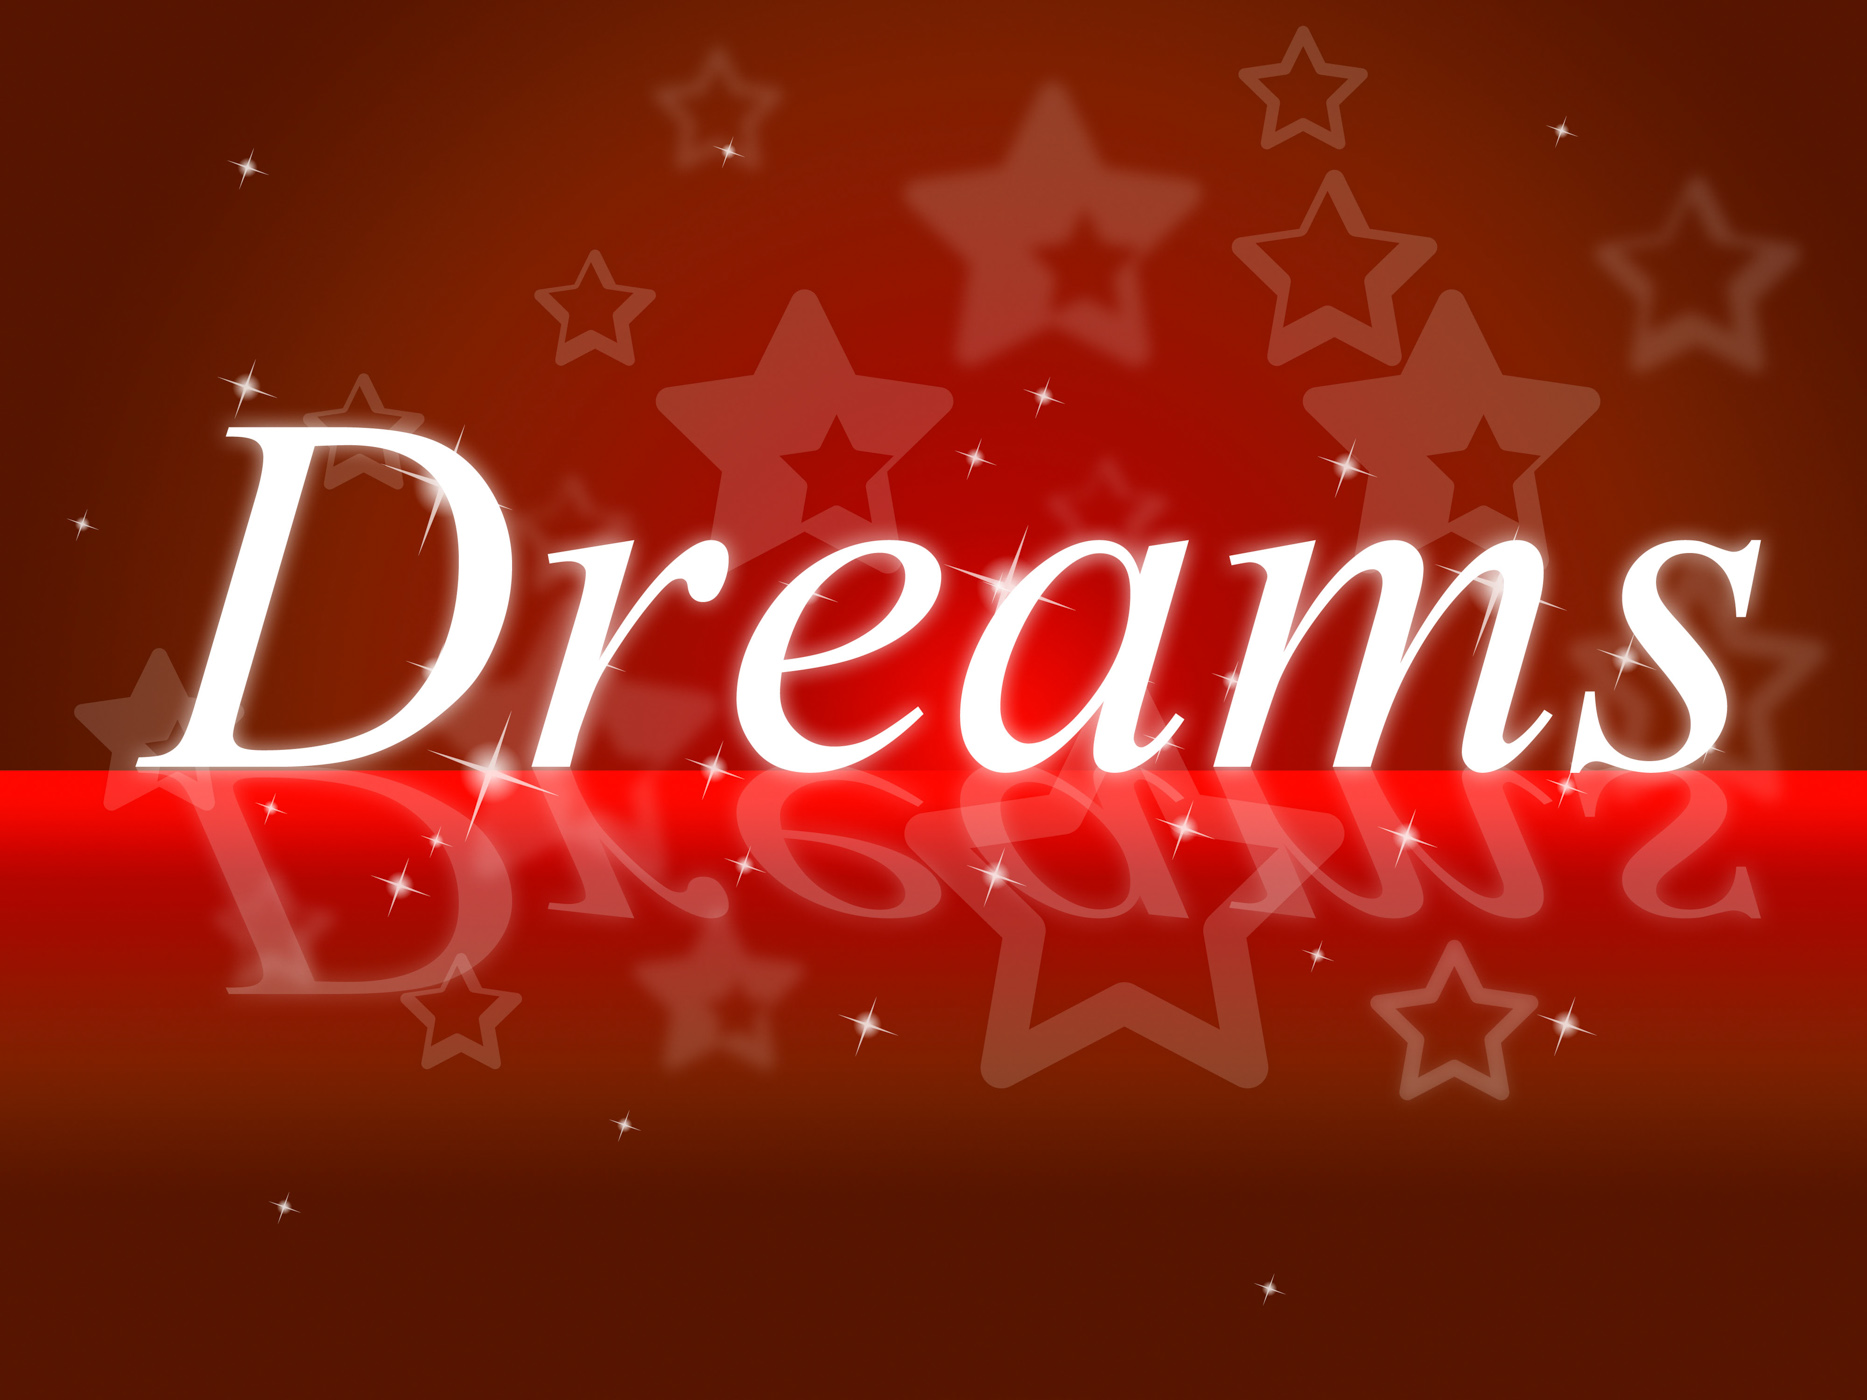 Dream Dreams Represents Wish Goal And Daydreamer, Aim, Vision, Sleep, Plans, HQ Photo